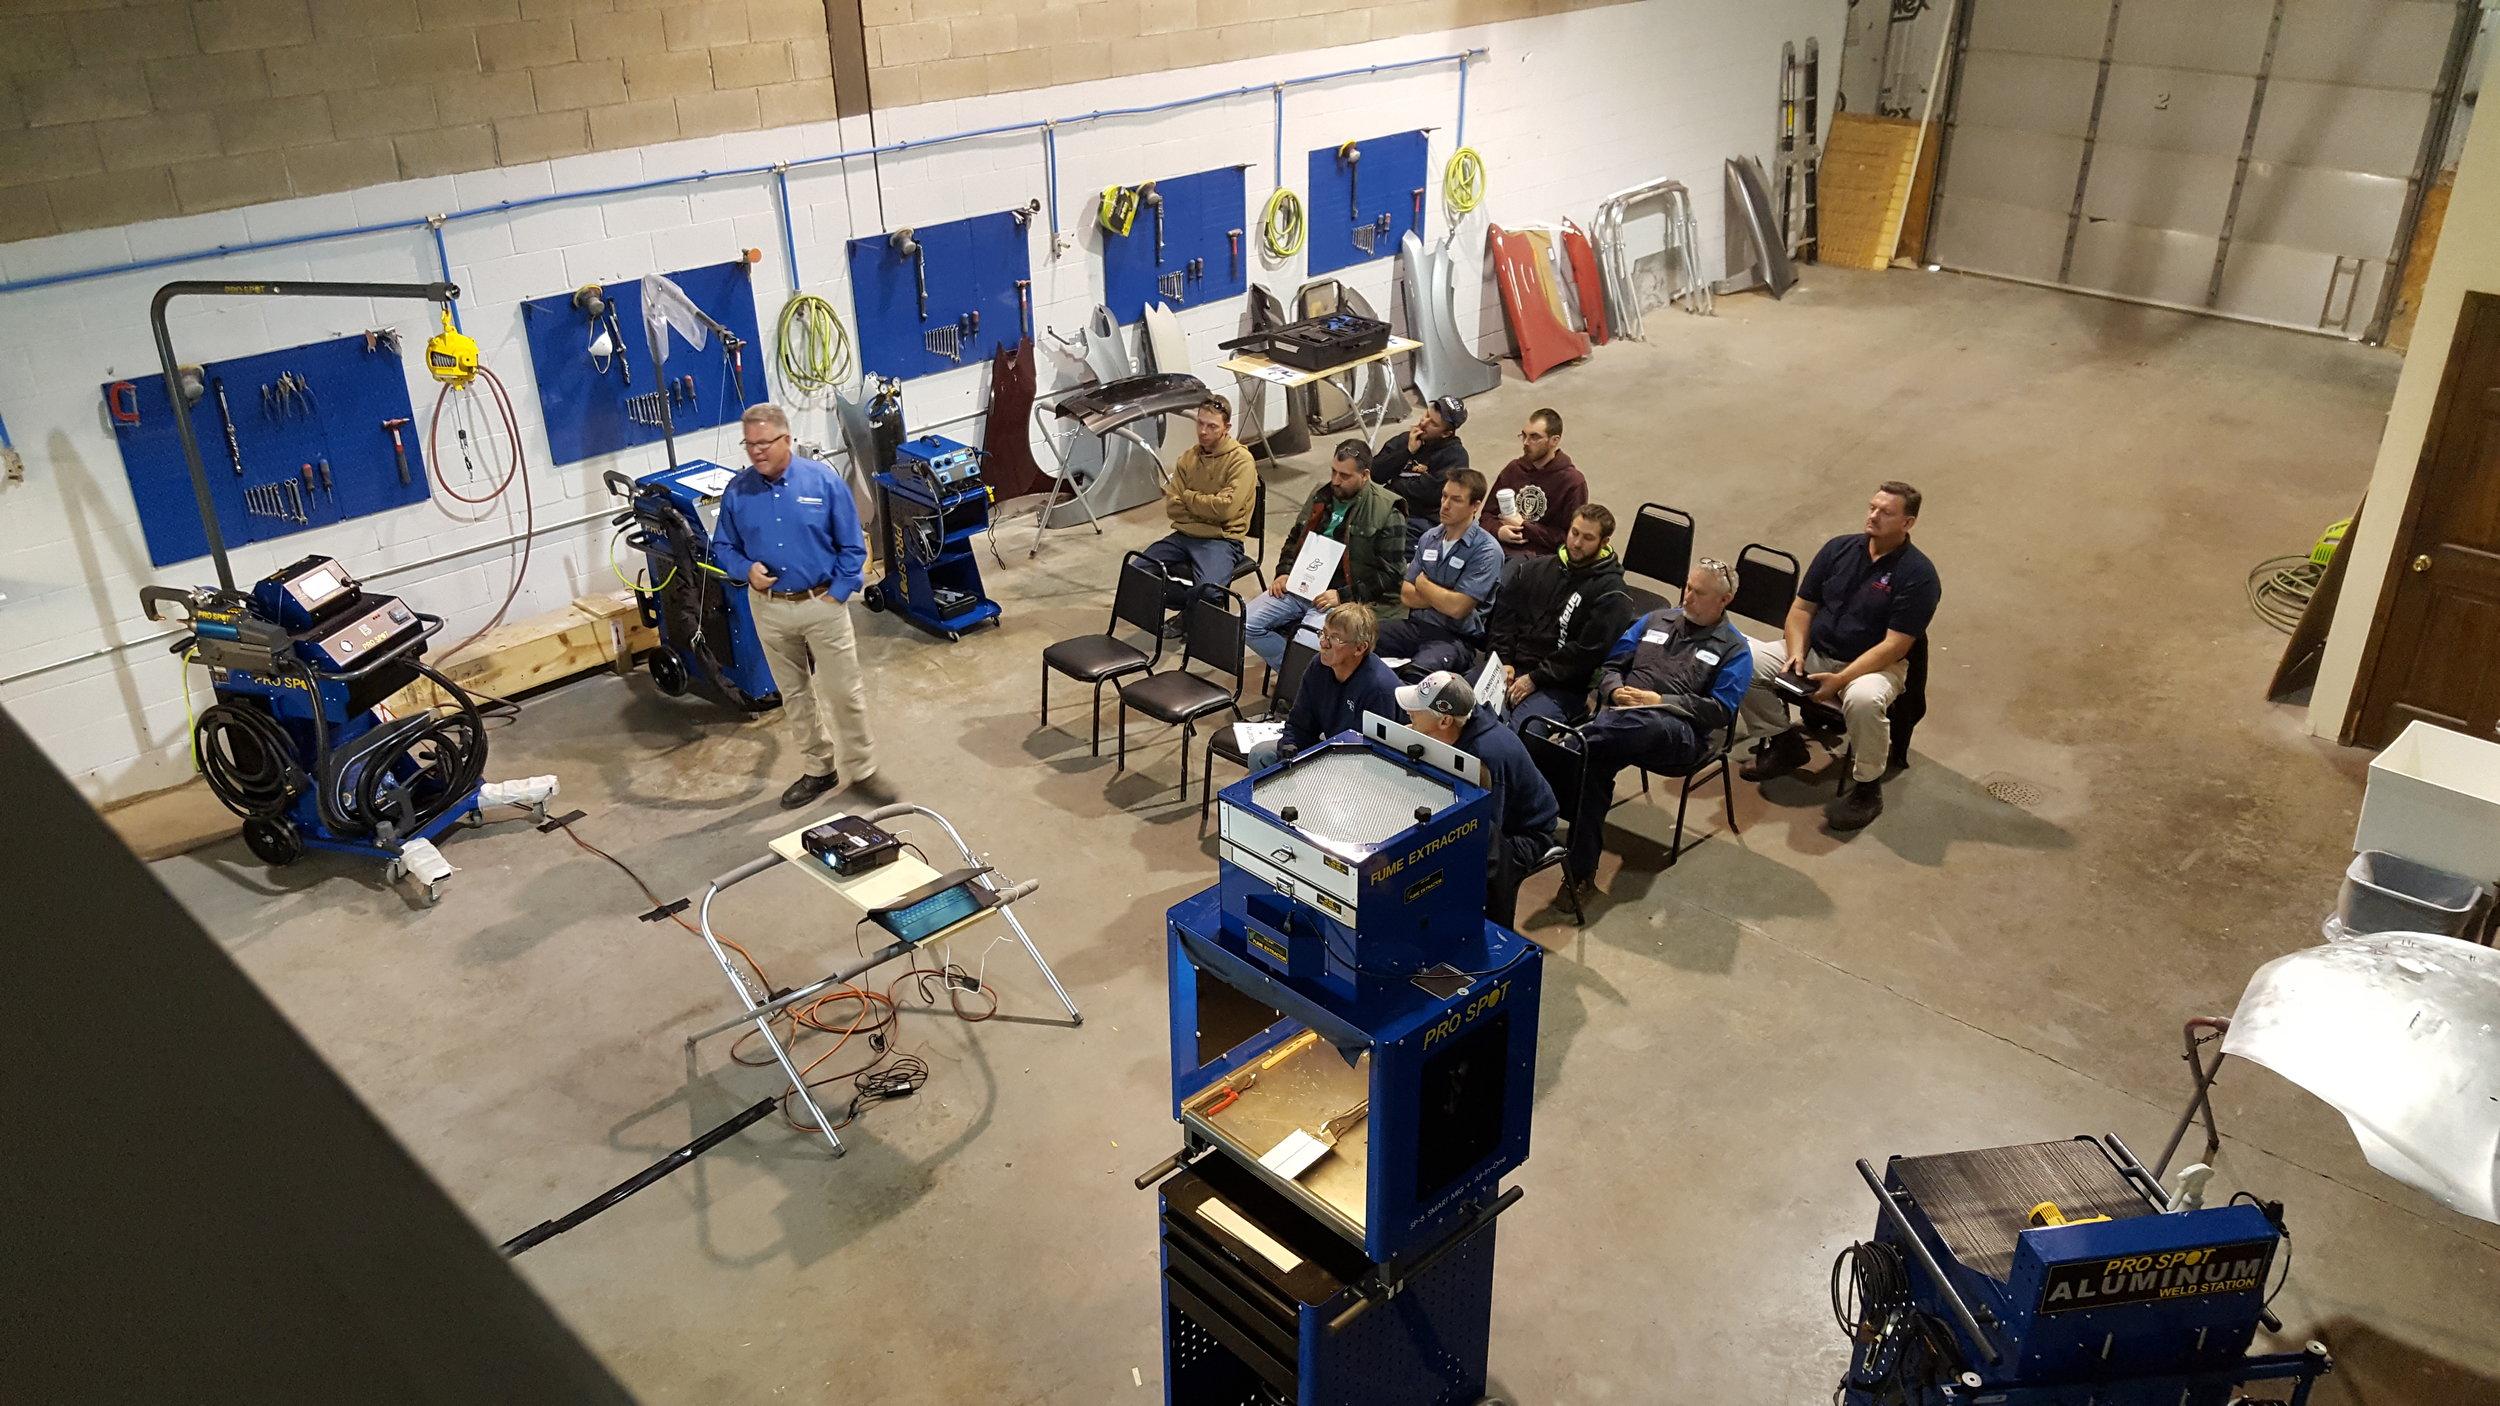 Training with Equipment